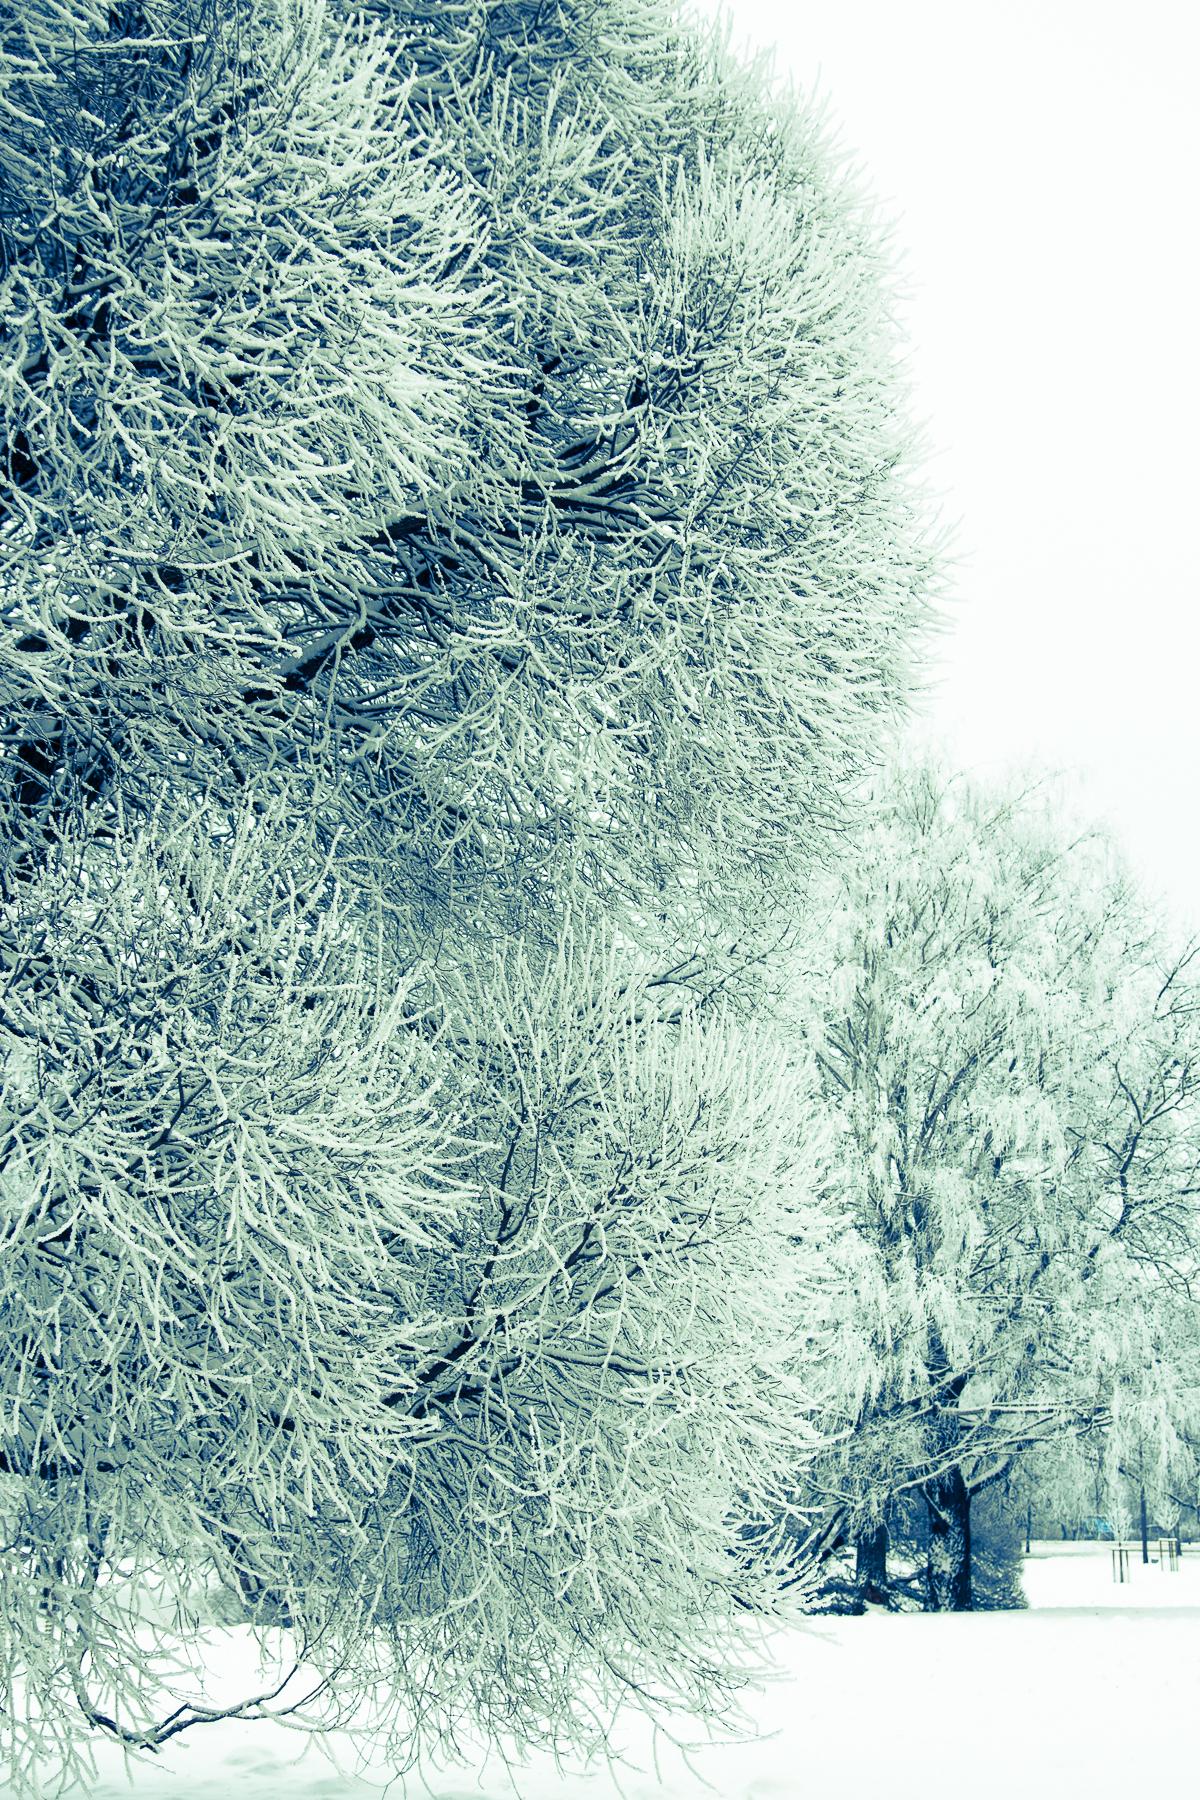 Winter Via @Atisgailis